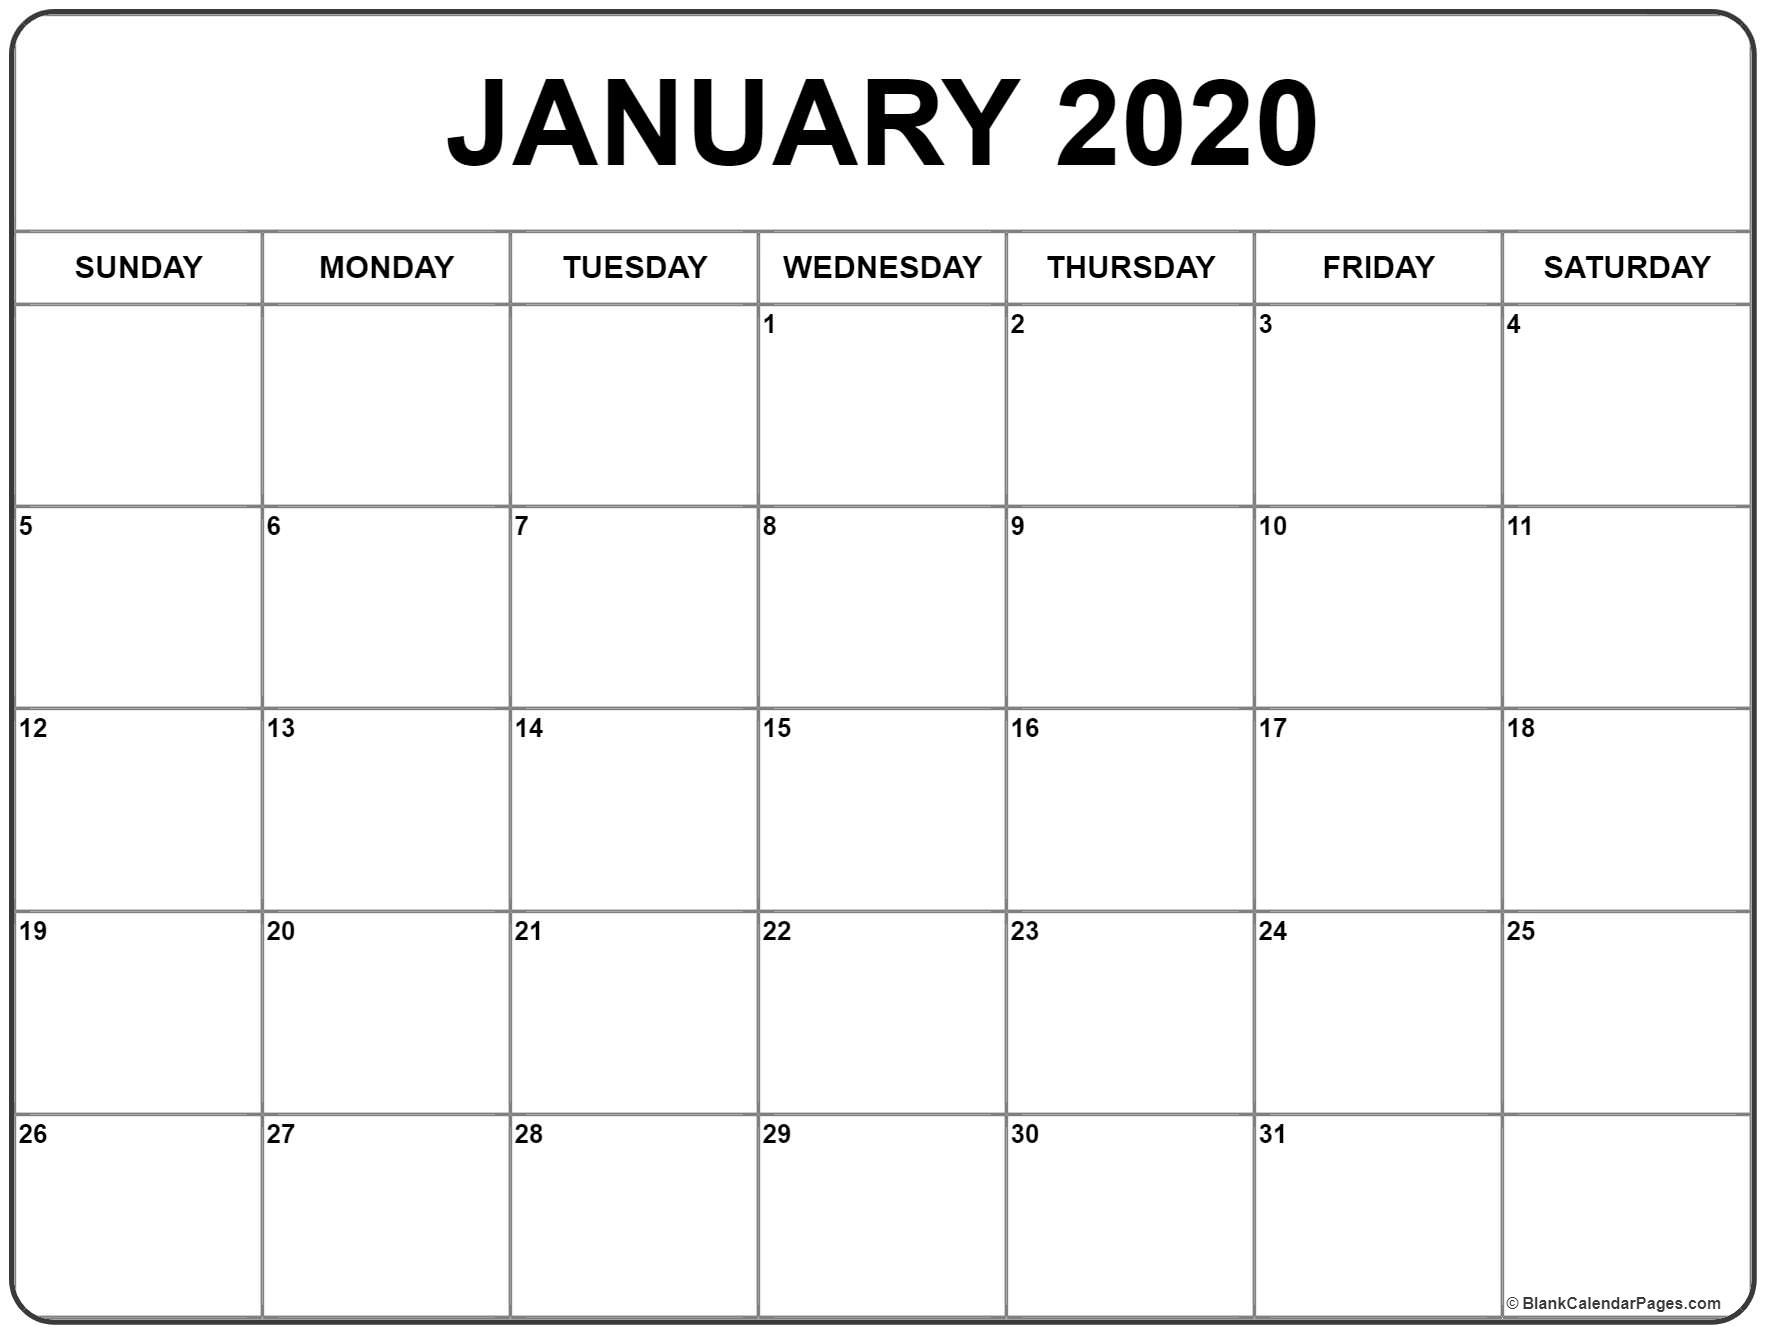 Printable January 2020 Calendar - Free Blank Templates-January 2020 Calendar Pdf